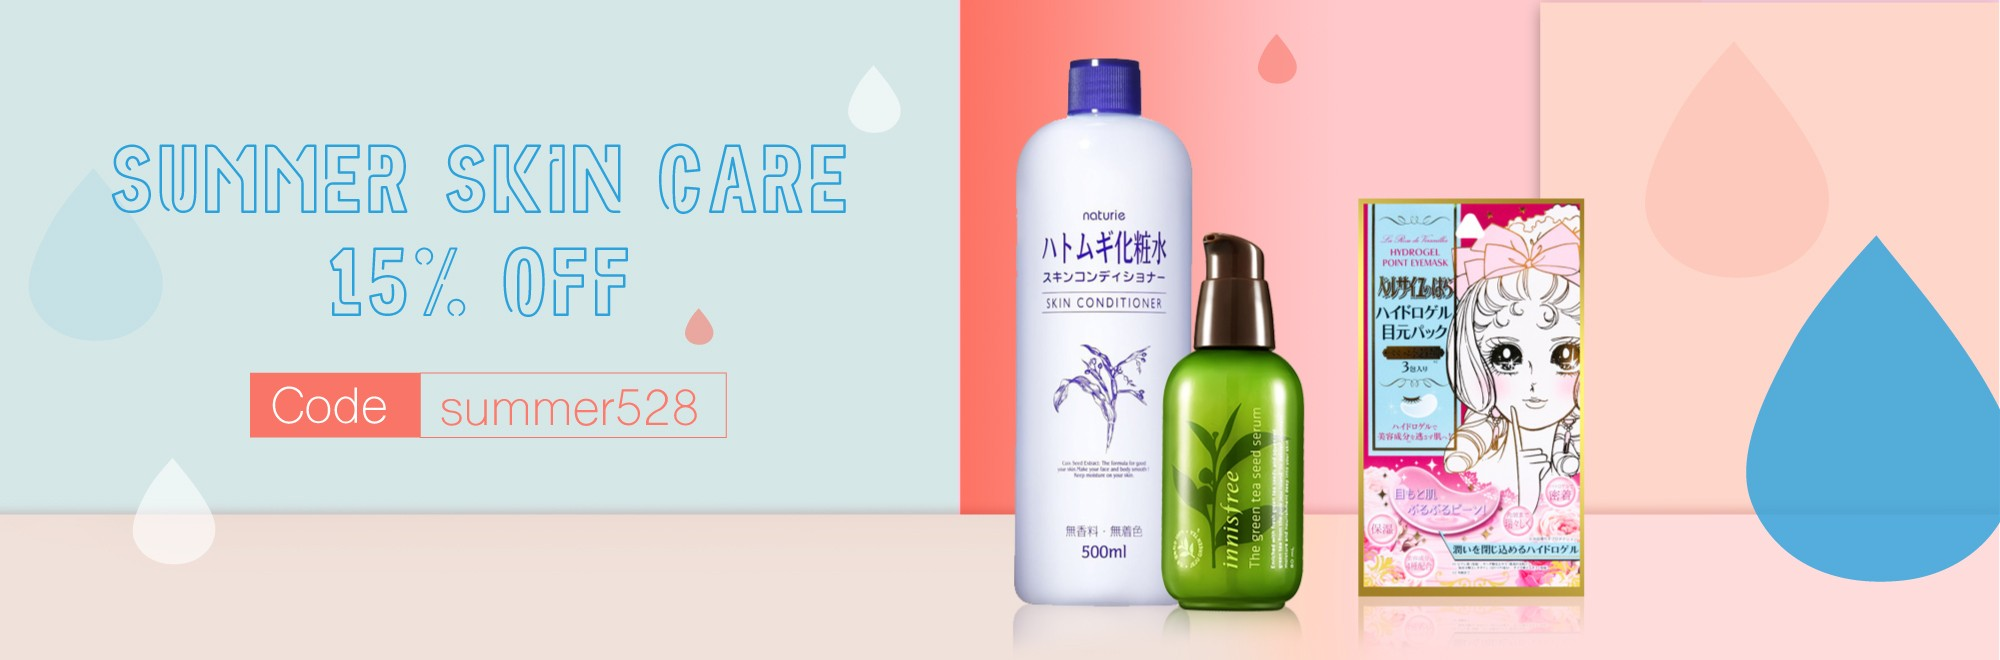 Summer Skin Care 15 Off Hatomugi Conditioner 500ml